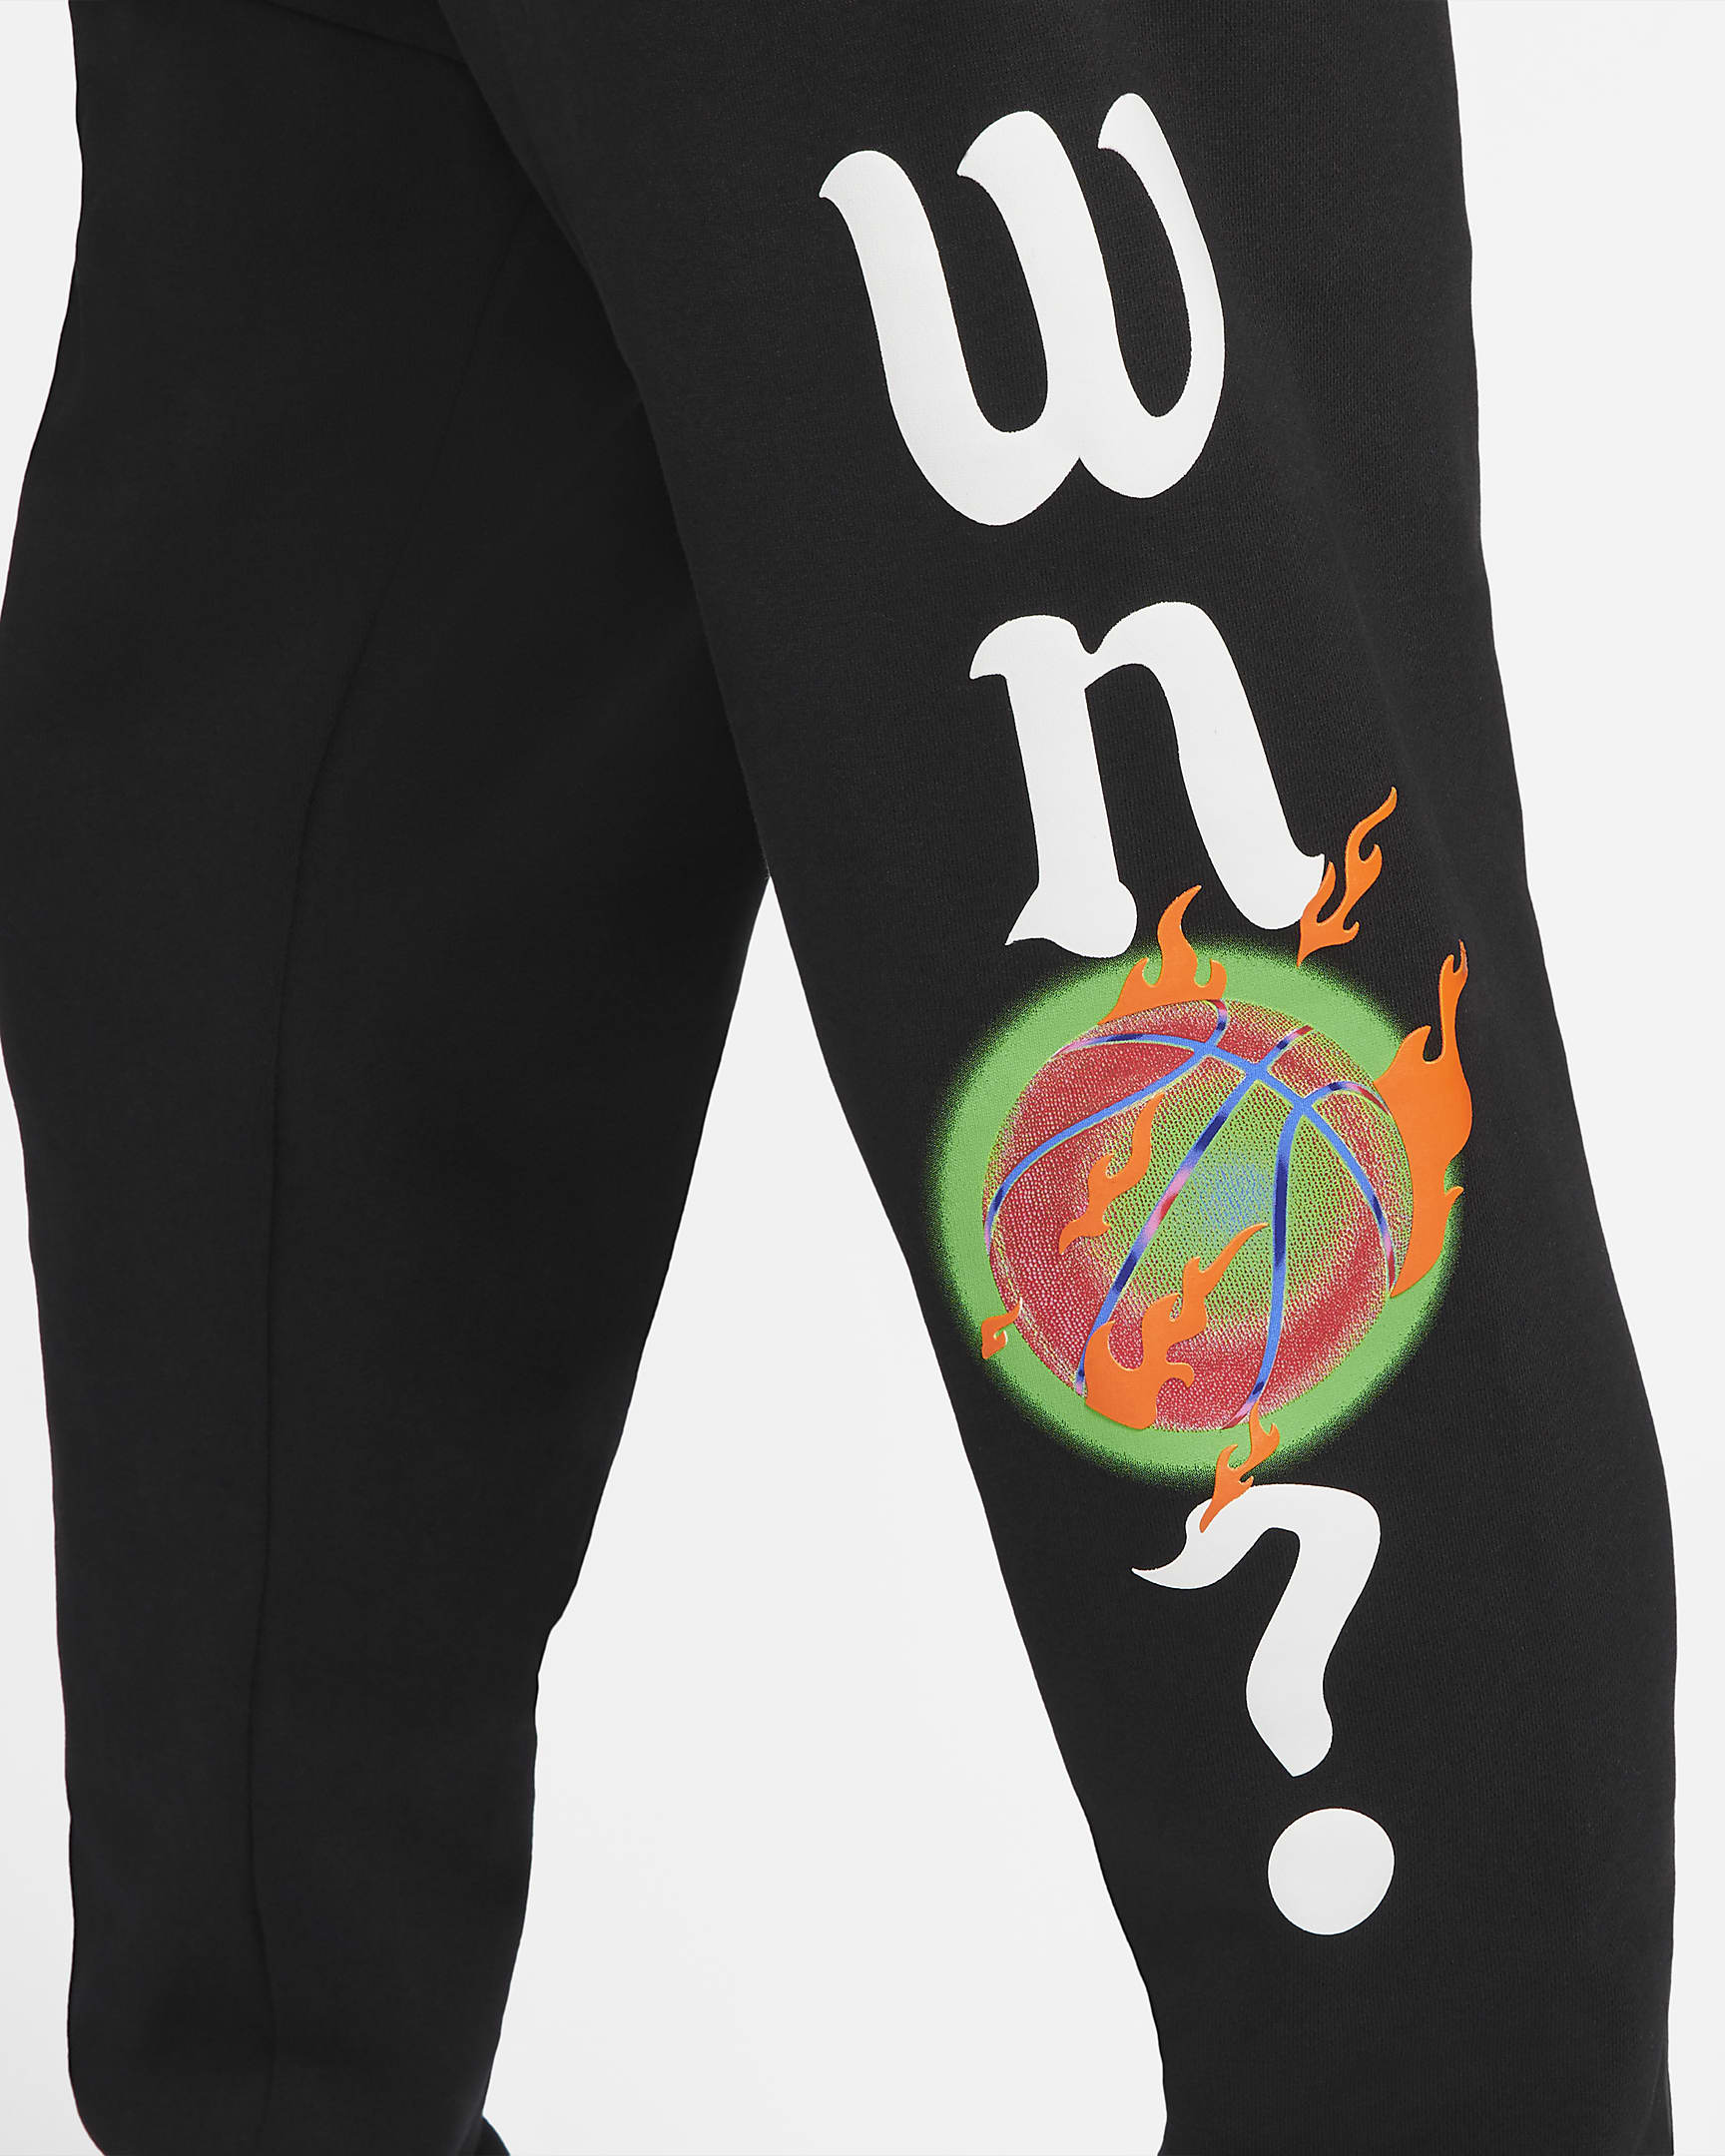 jordan-why-not-fleece-trousers-g30Kvc-6